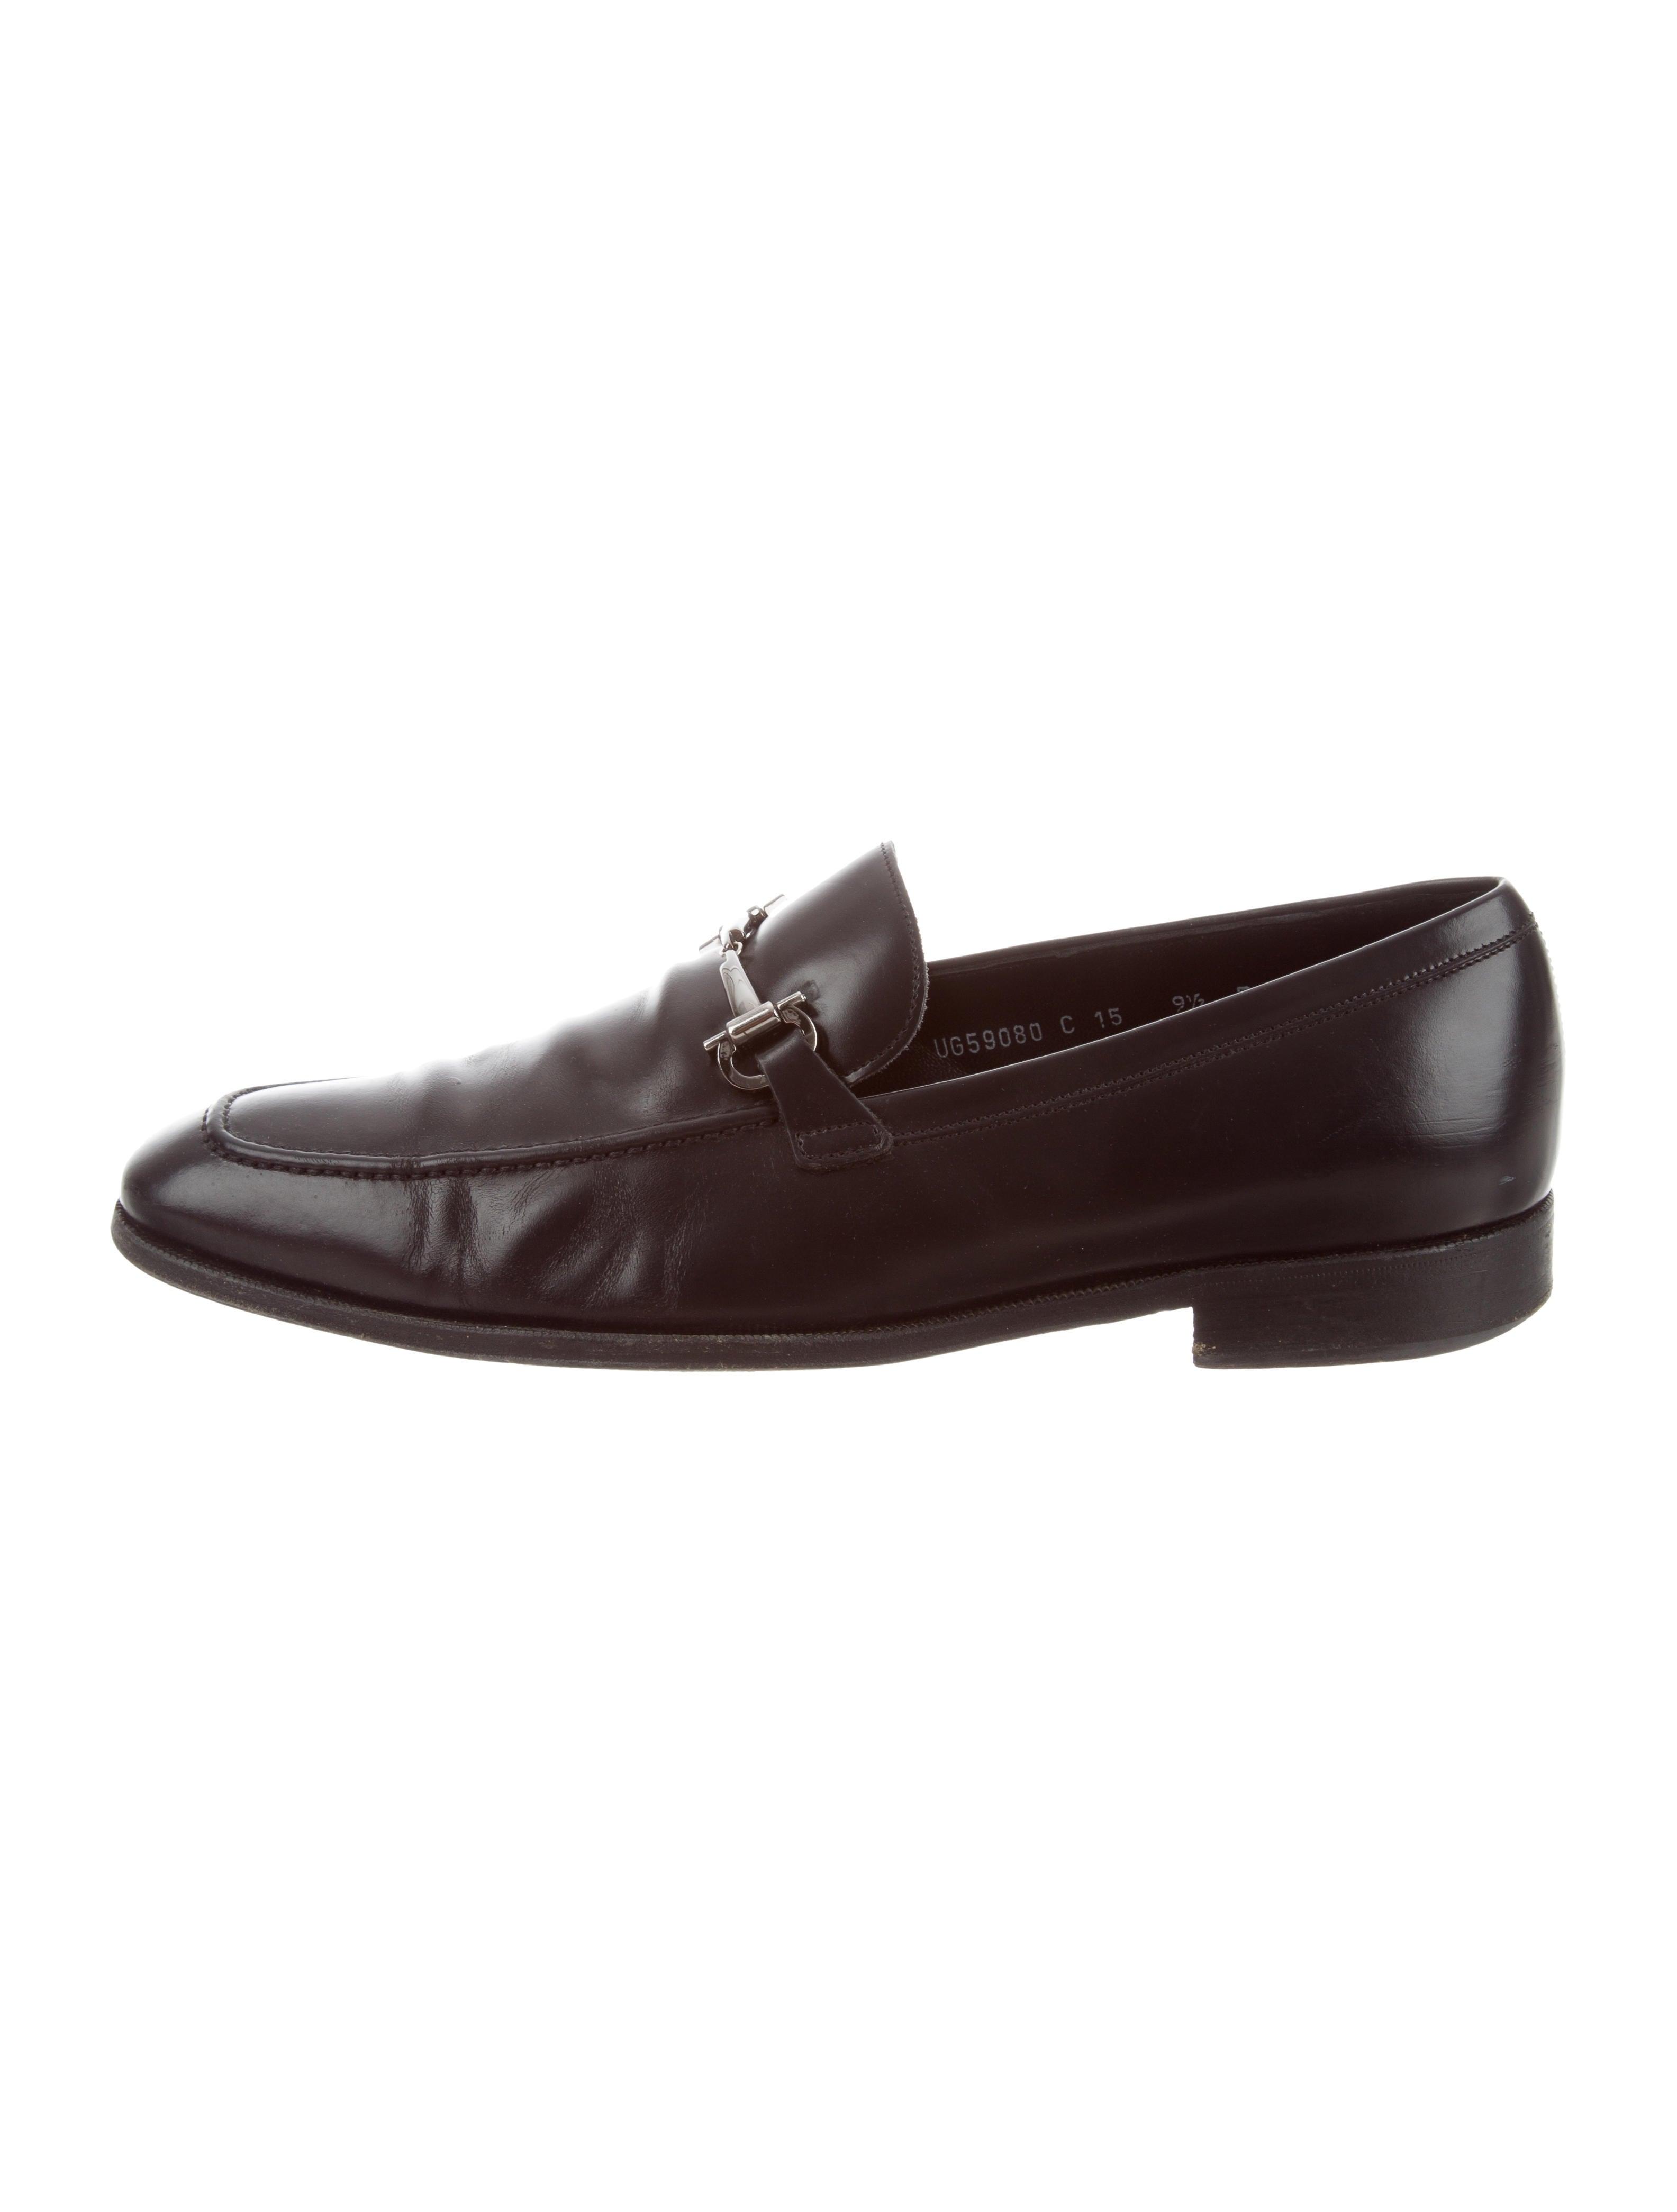 5d7fa00d8f2 Salvatore Ferragamo Fenice Gancini Loafers - Shoes - SAL75041